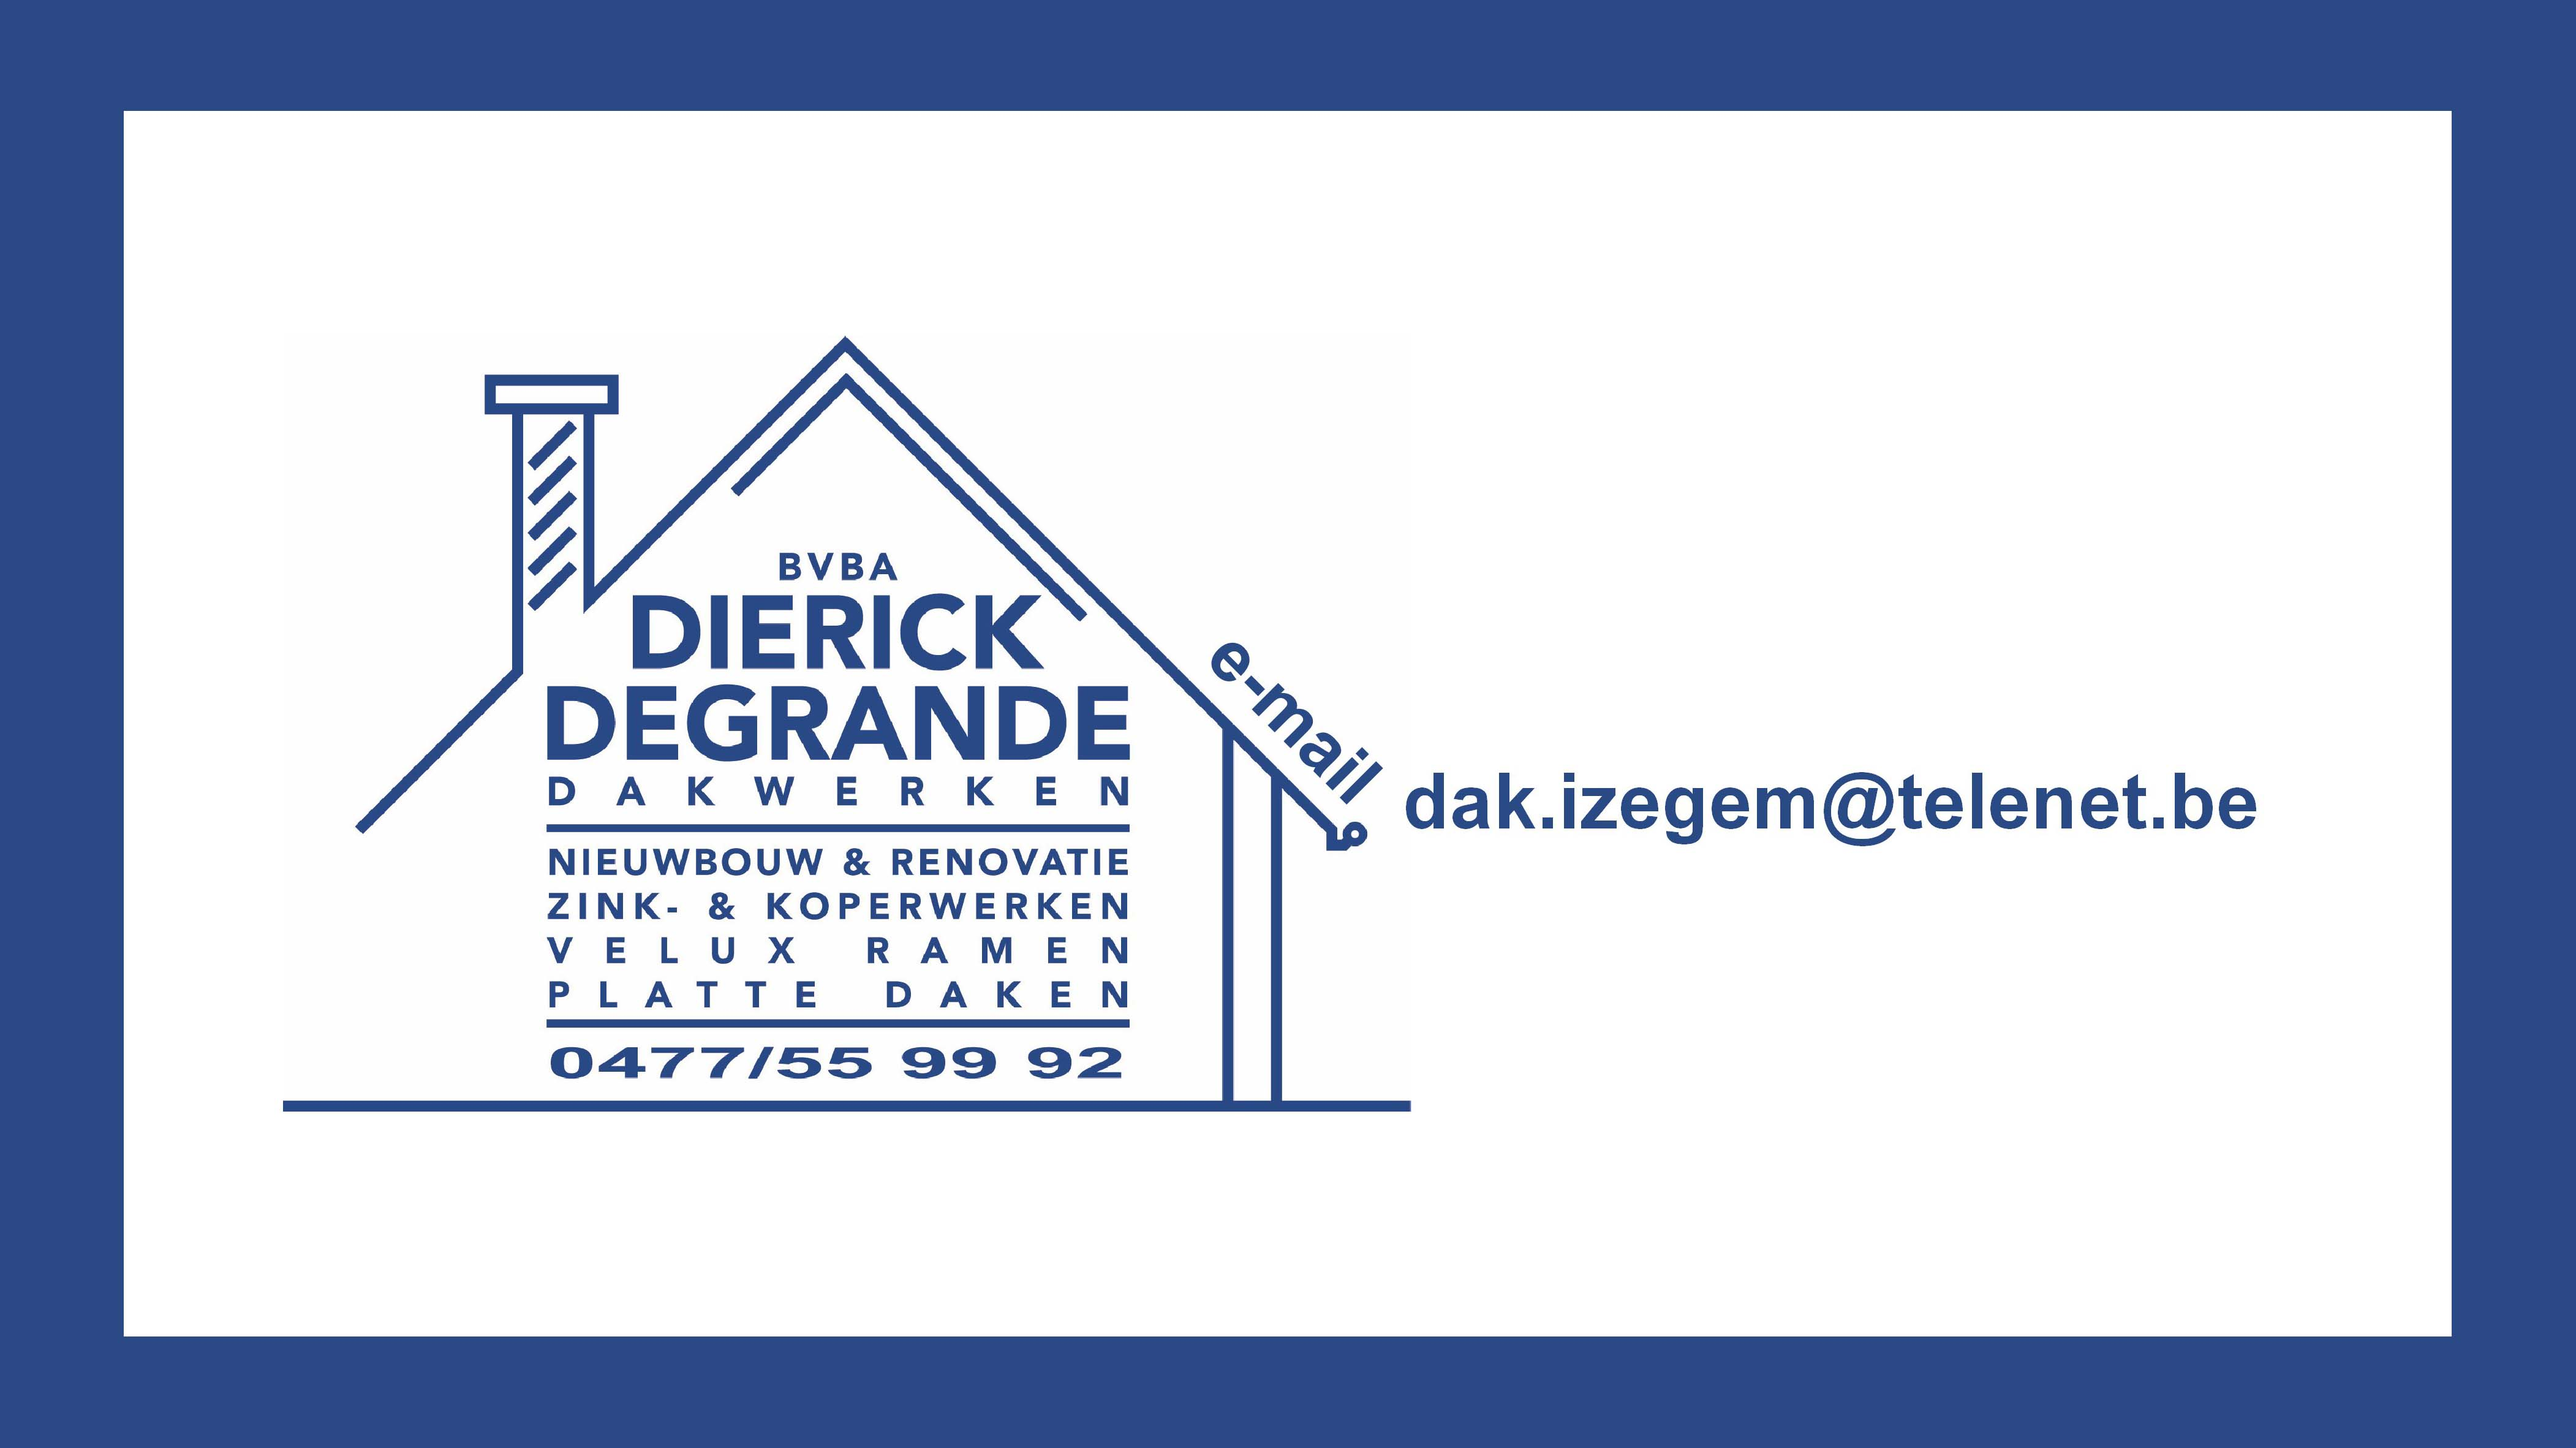 04-Monitor-Dierick-Degrande